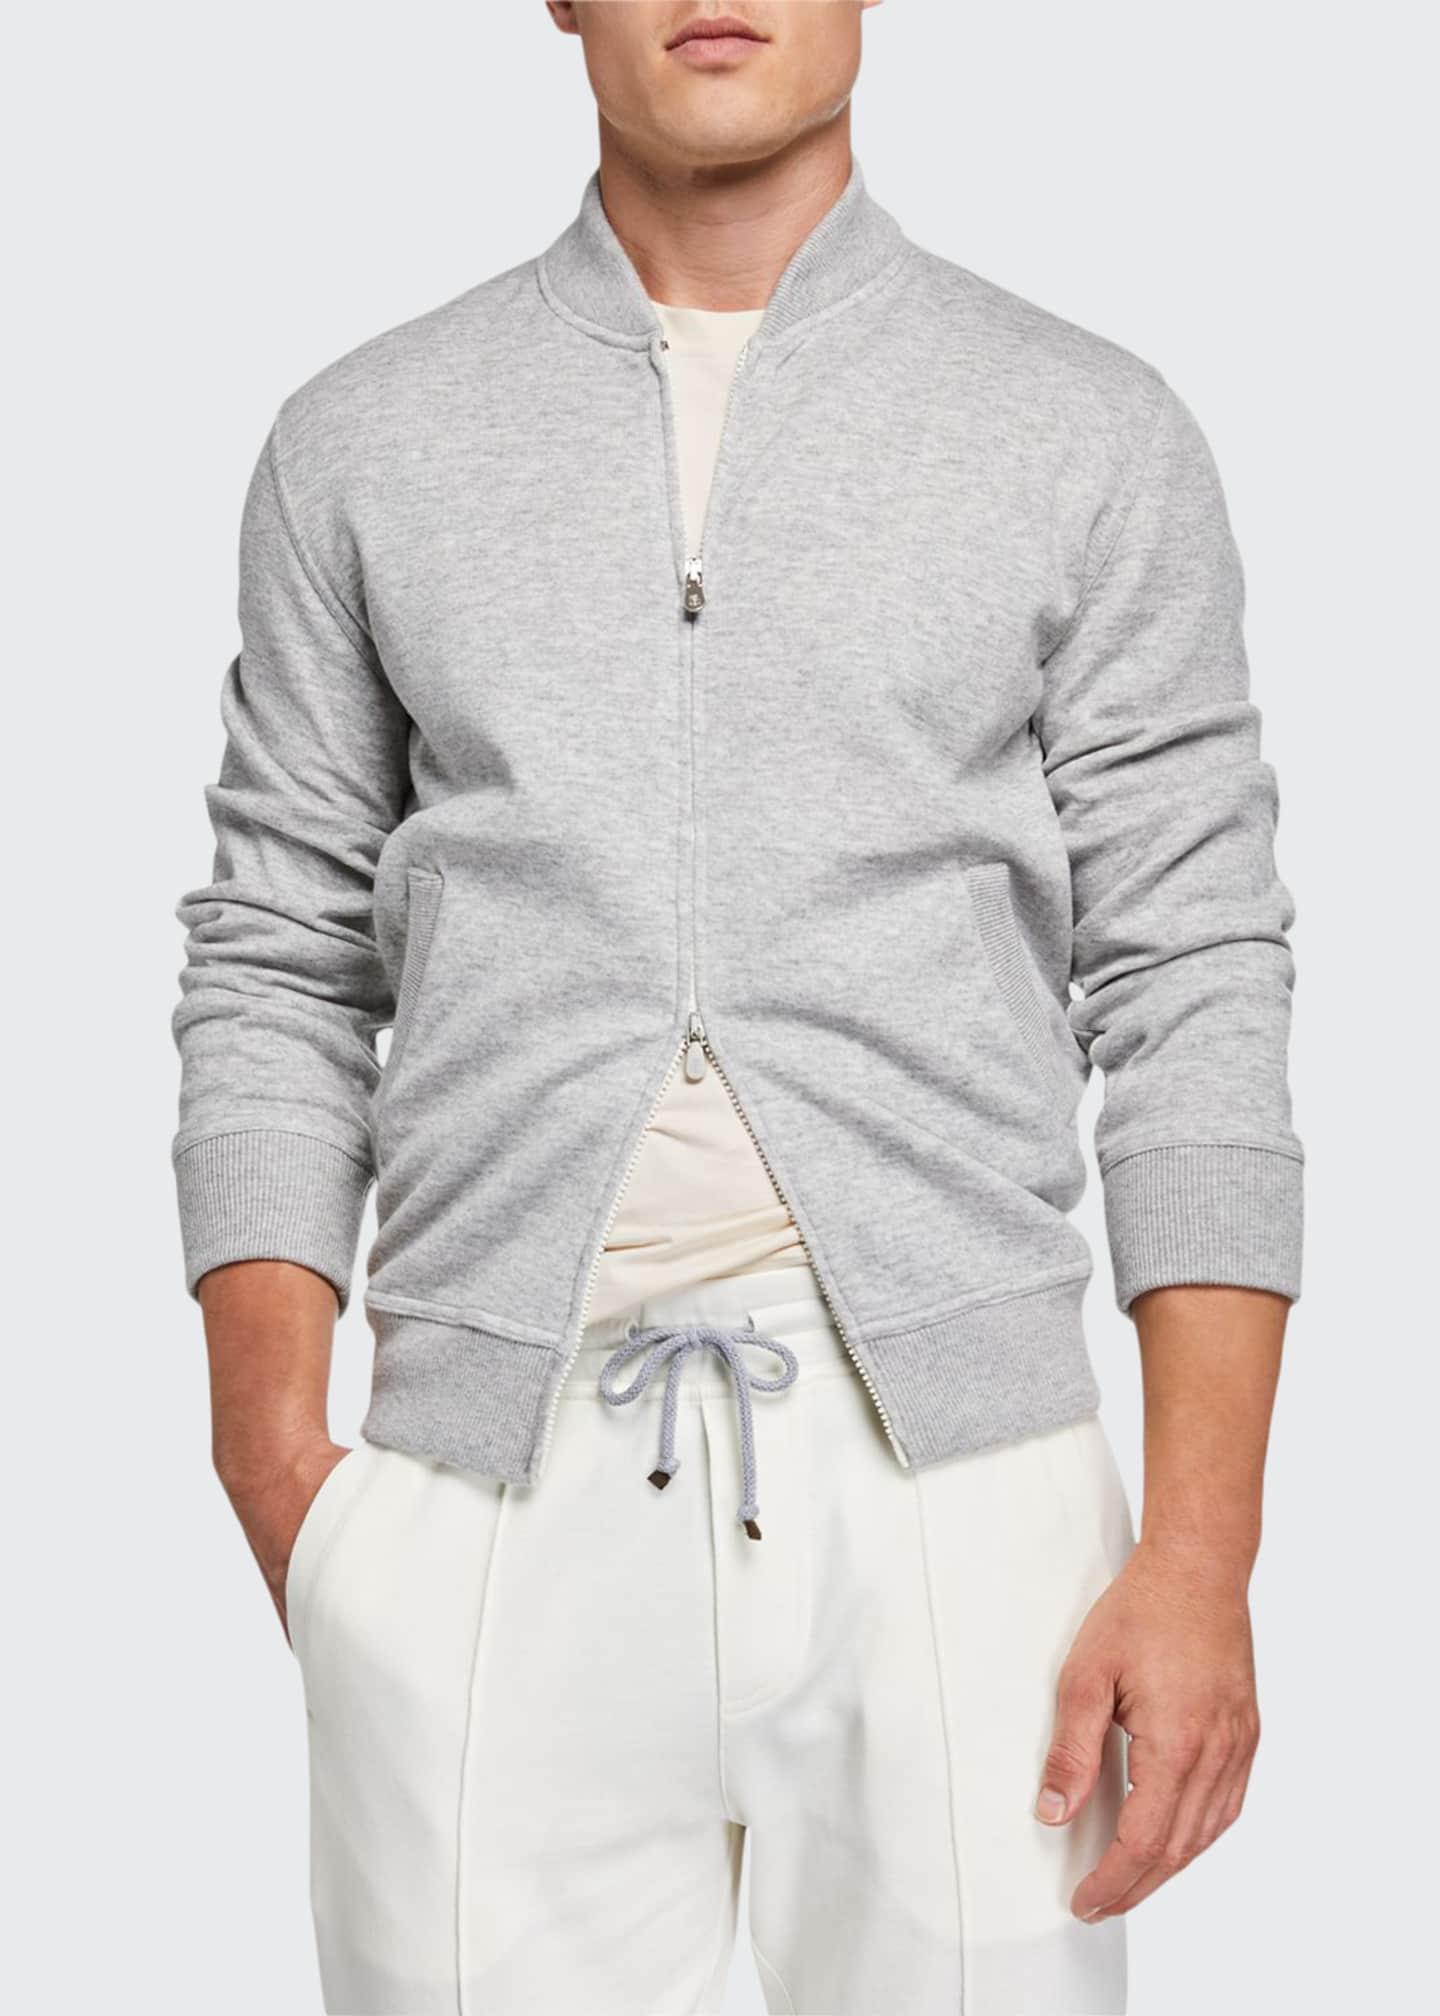 Brunello Cucinelli Men's Zip-Front Cashmere/Cotton Sweatshirt